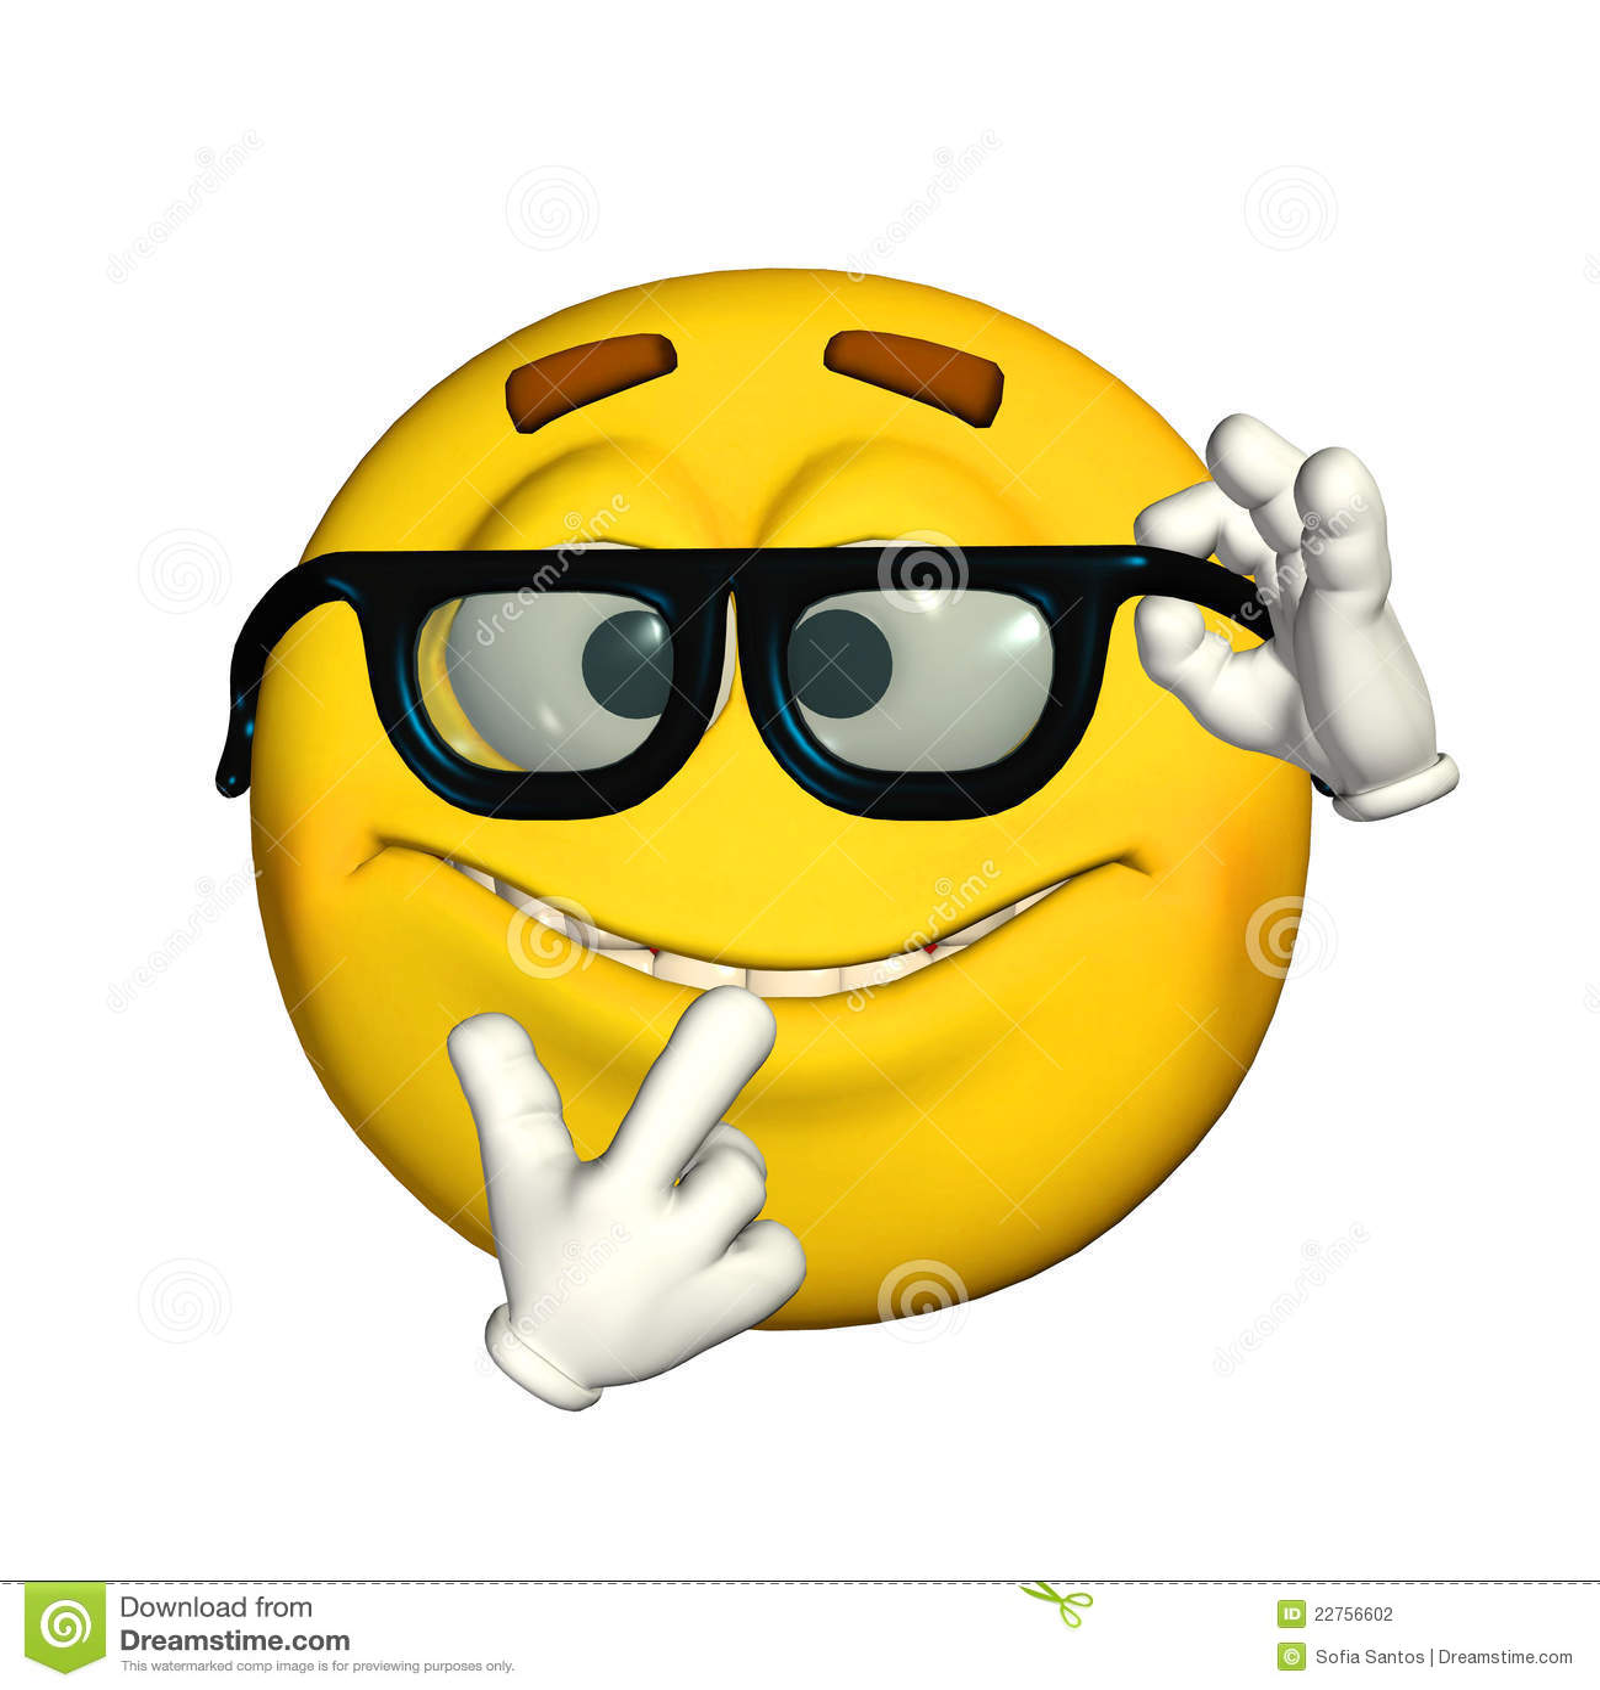 Geek Or Nerd Emoticon Stock Vector - Image: 58328875